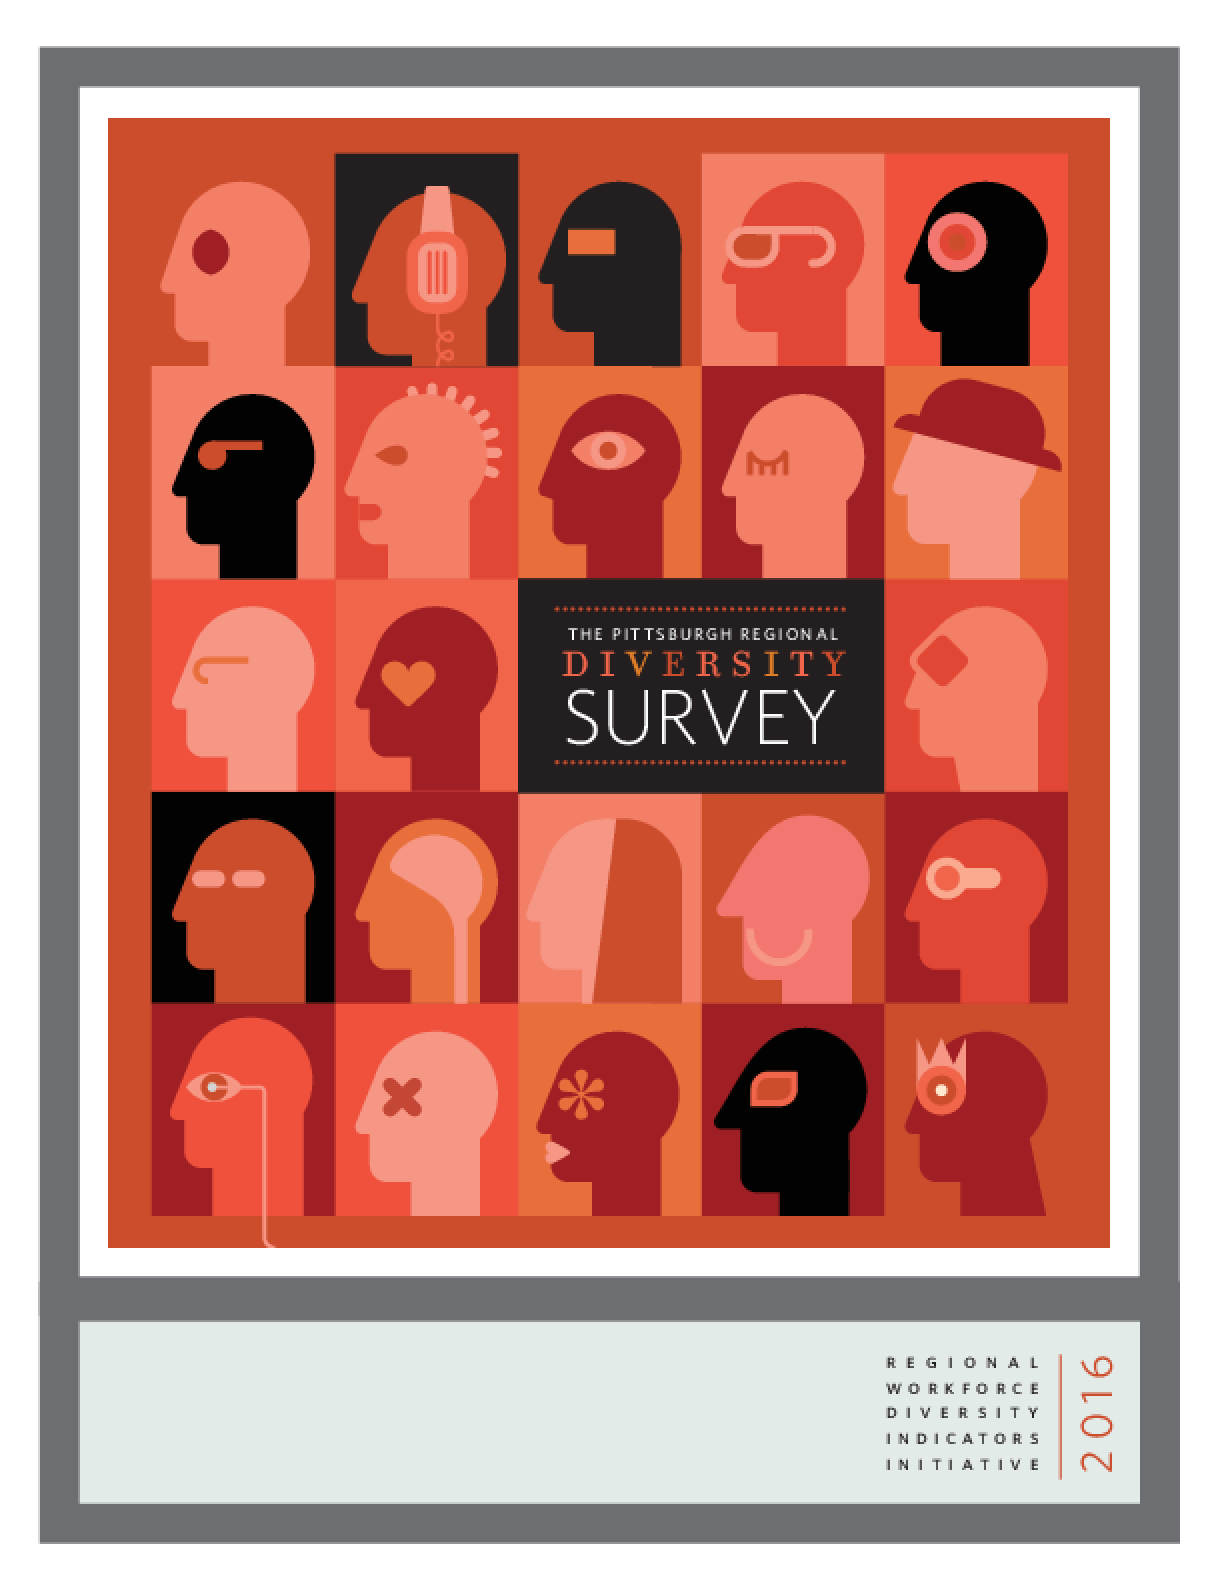 The Pittsburgh Regional Diversity Survey